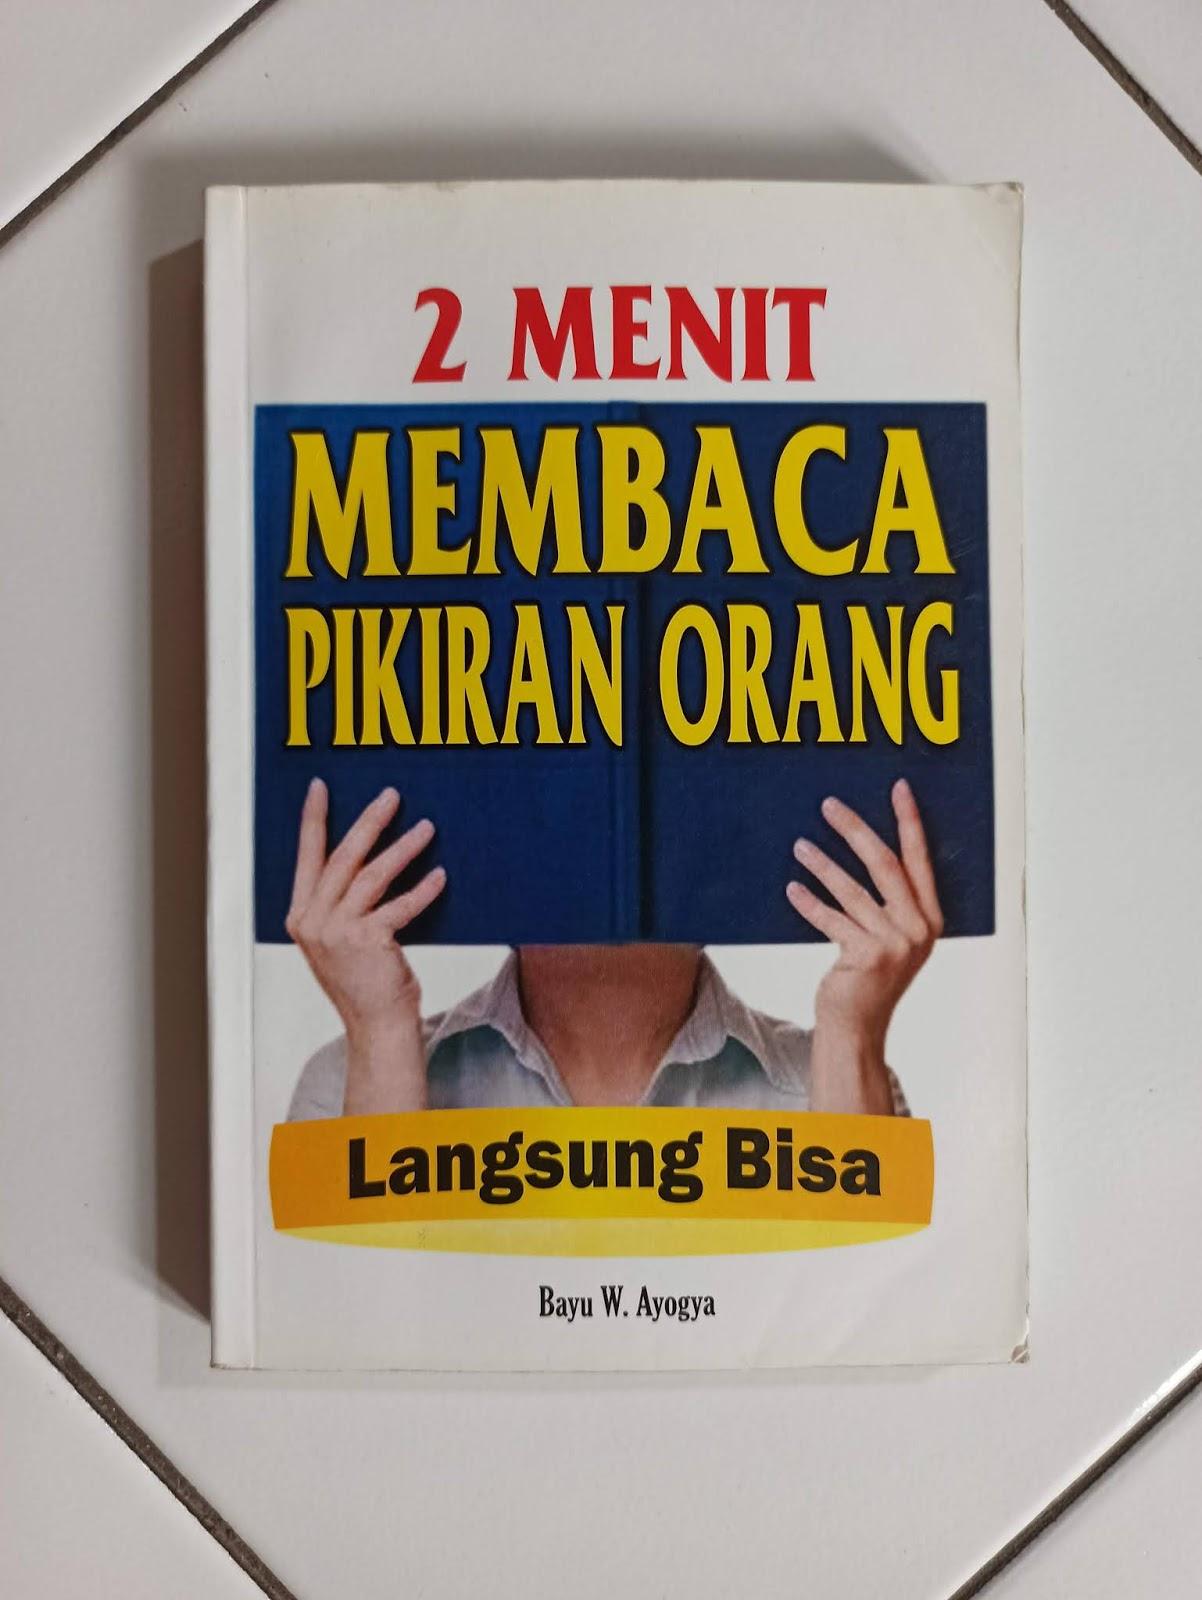 Buku karya Bayu W. Ayogya